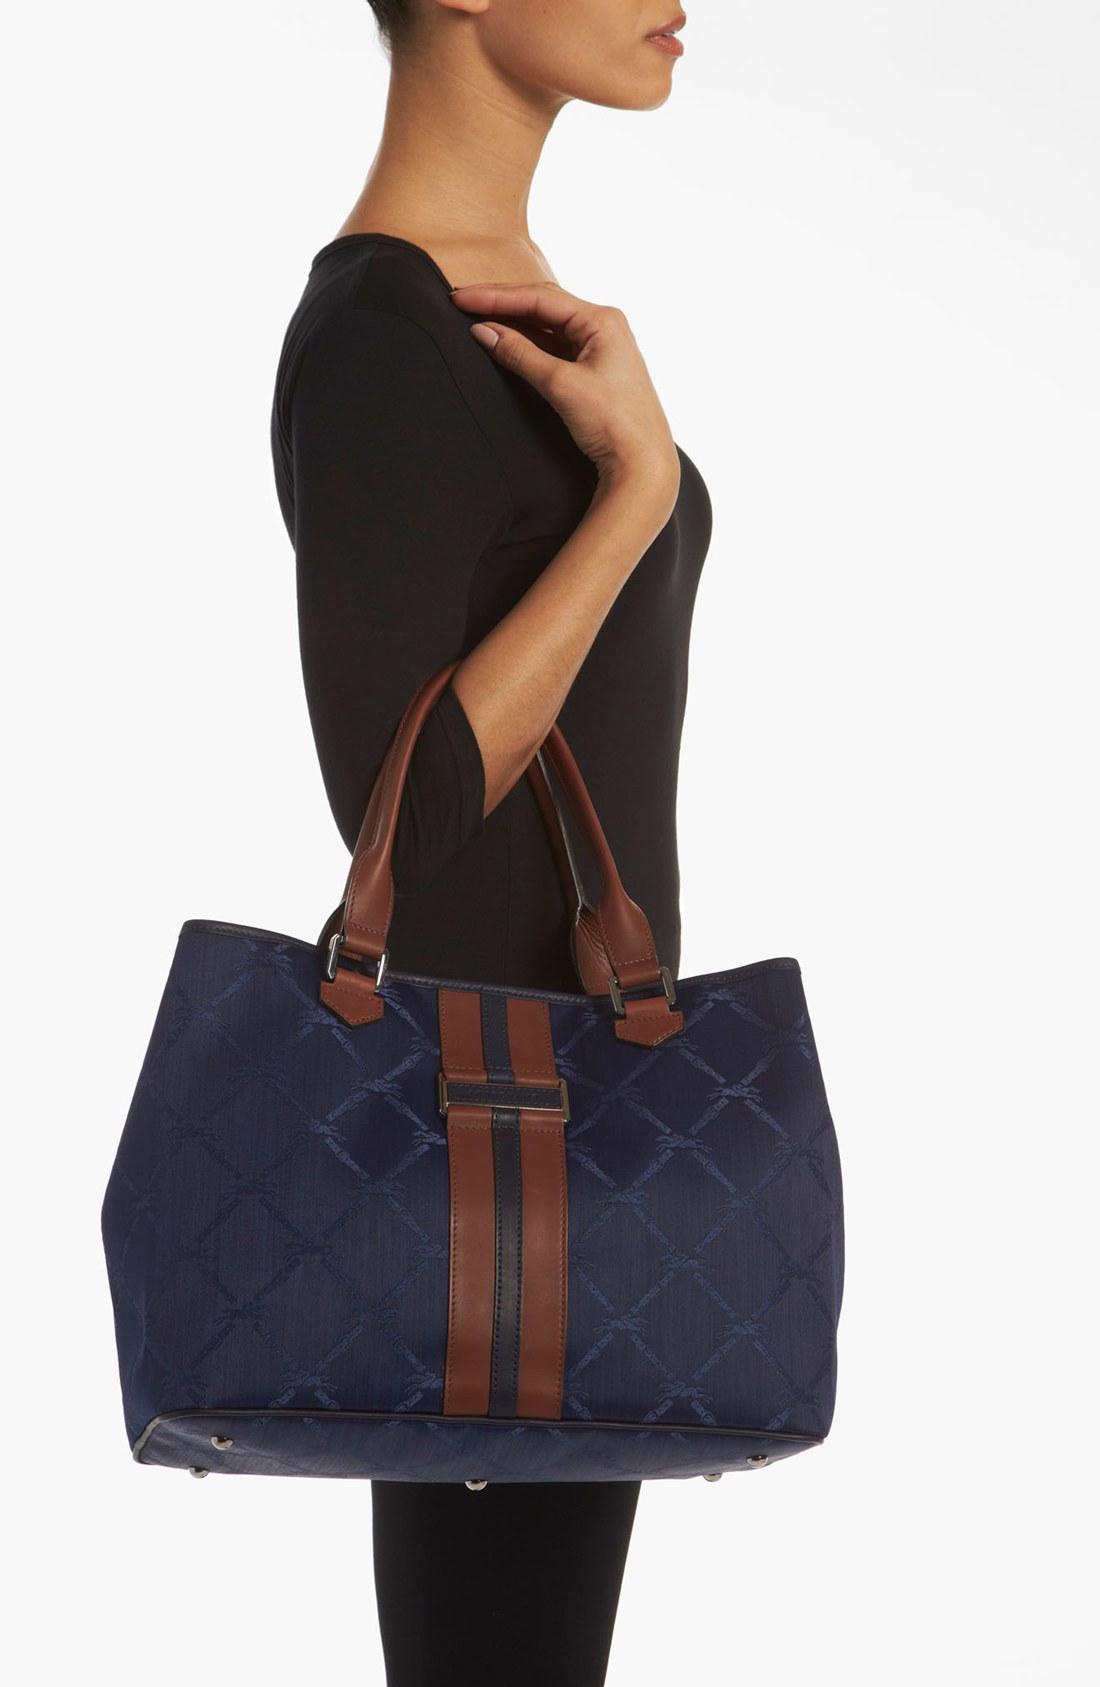 Longchamp Jacquard Bag